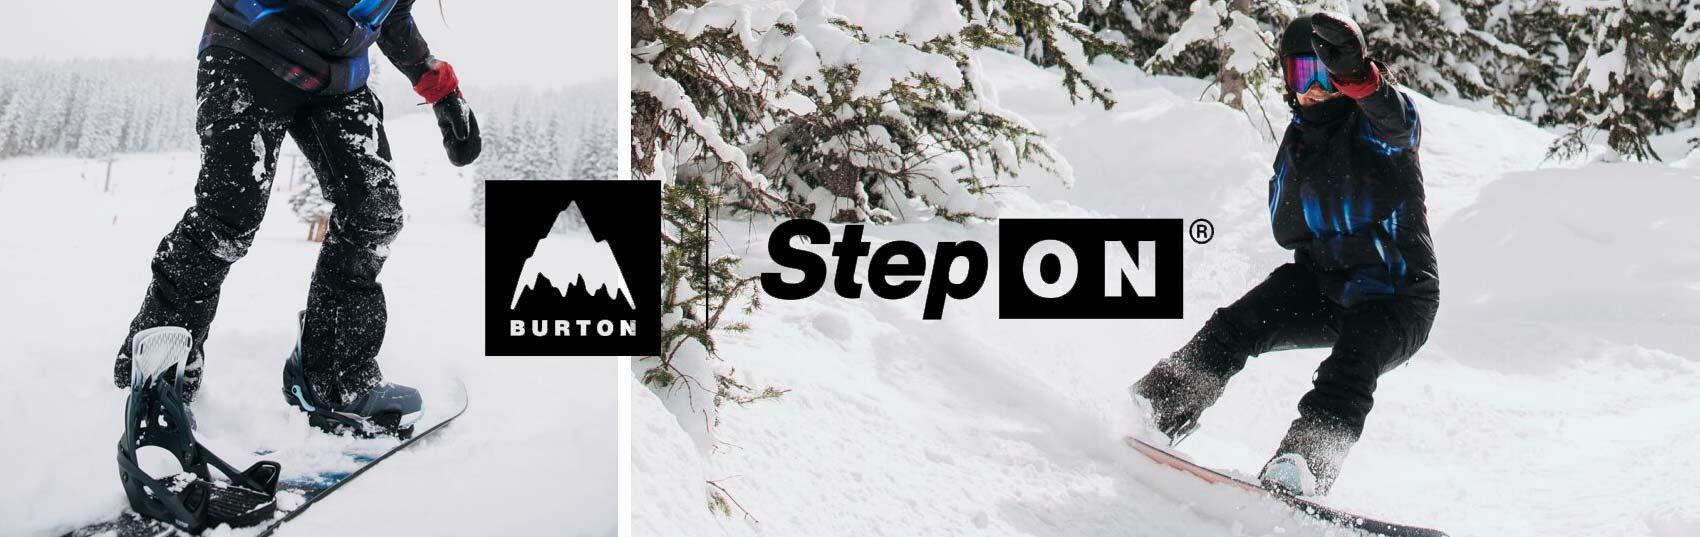 BURTON STEP ON 2022